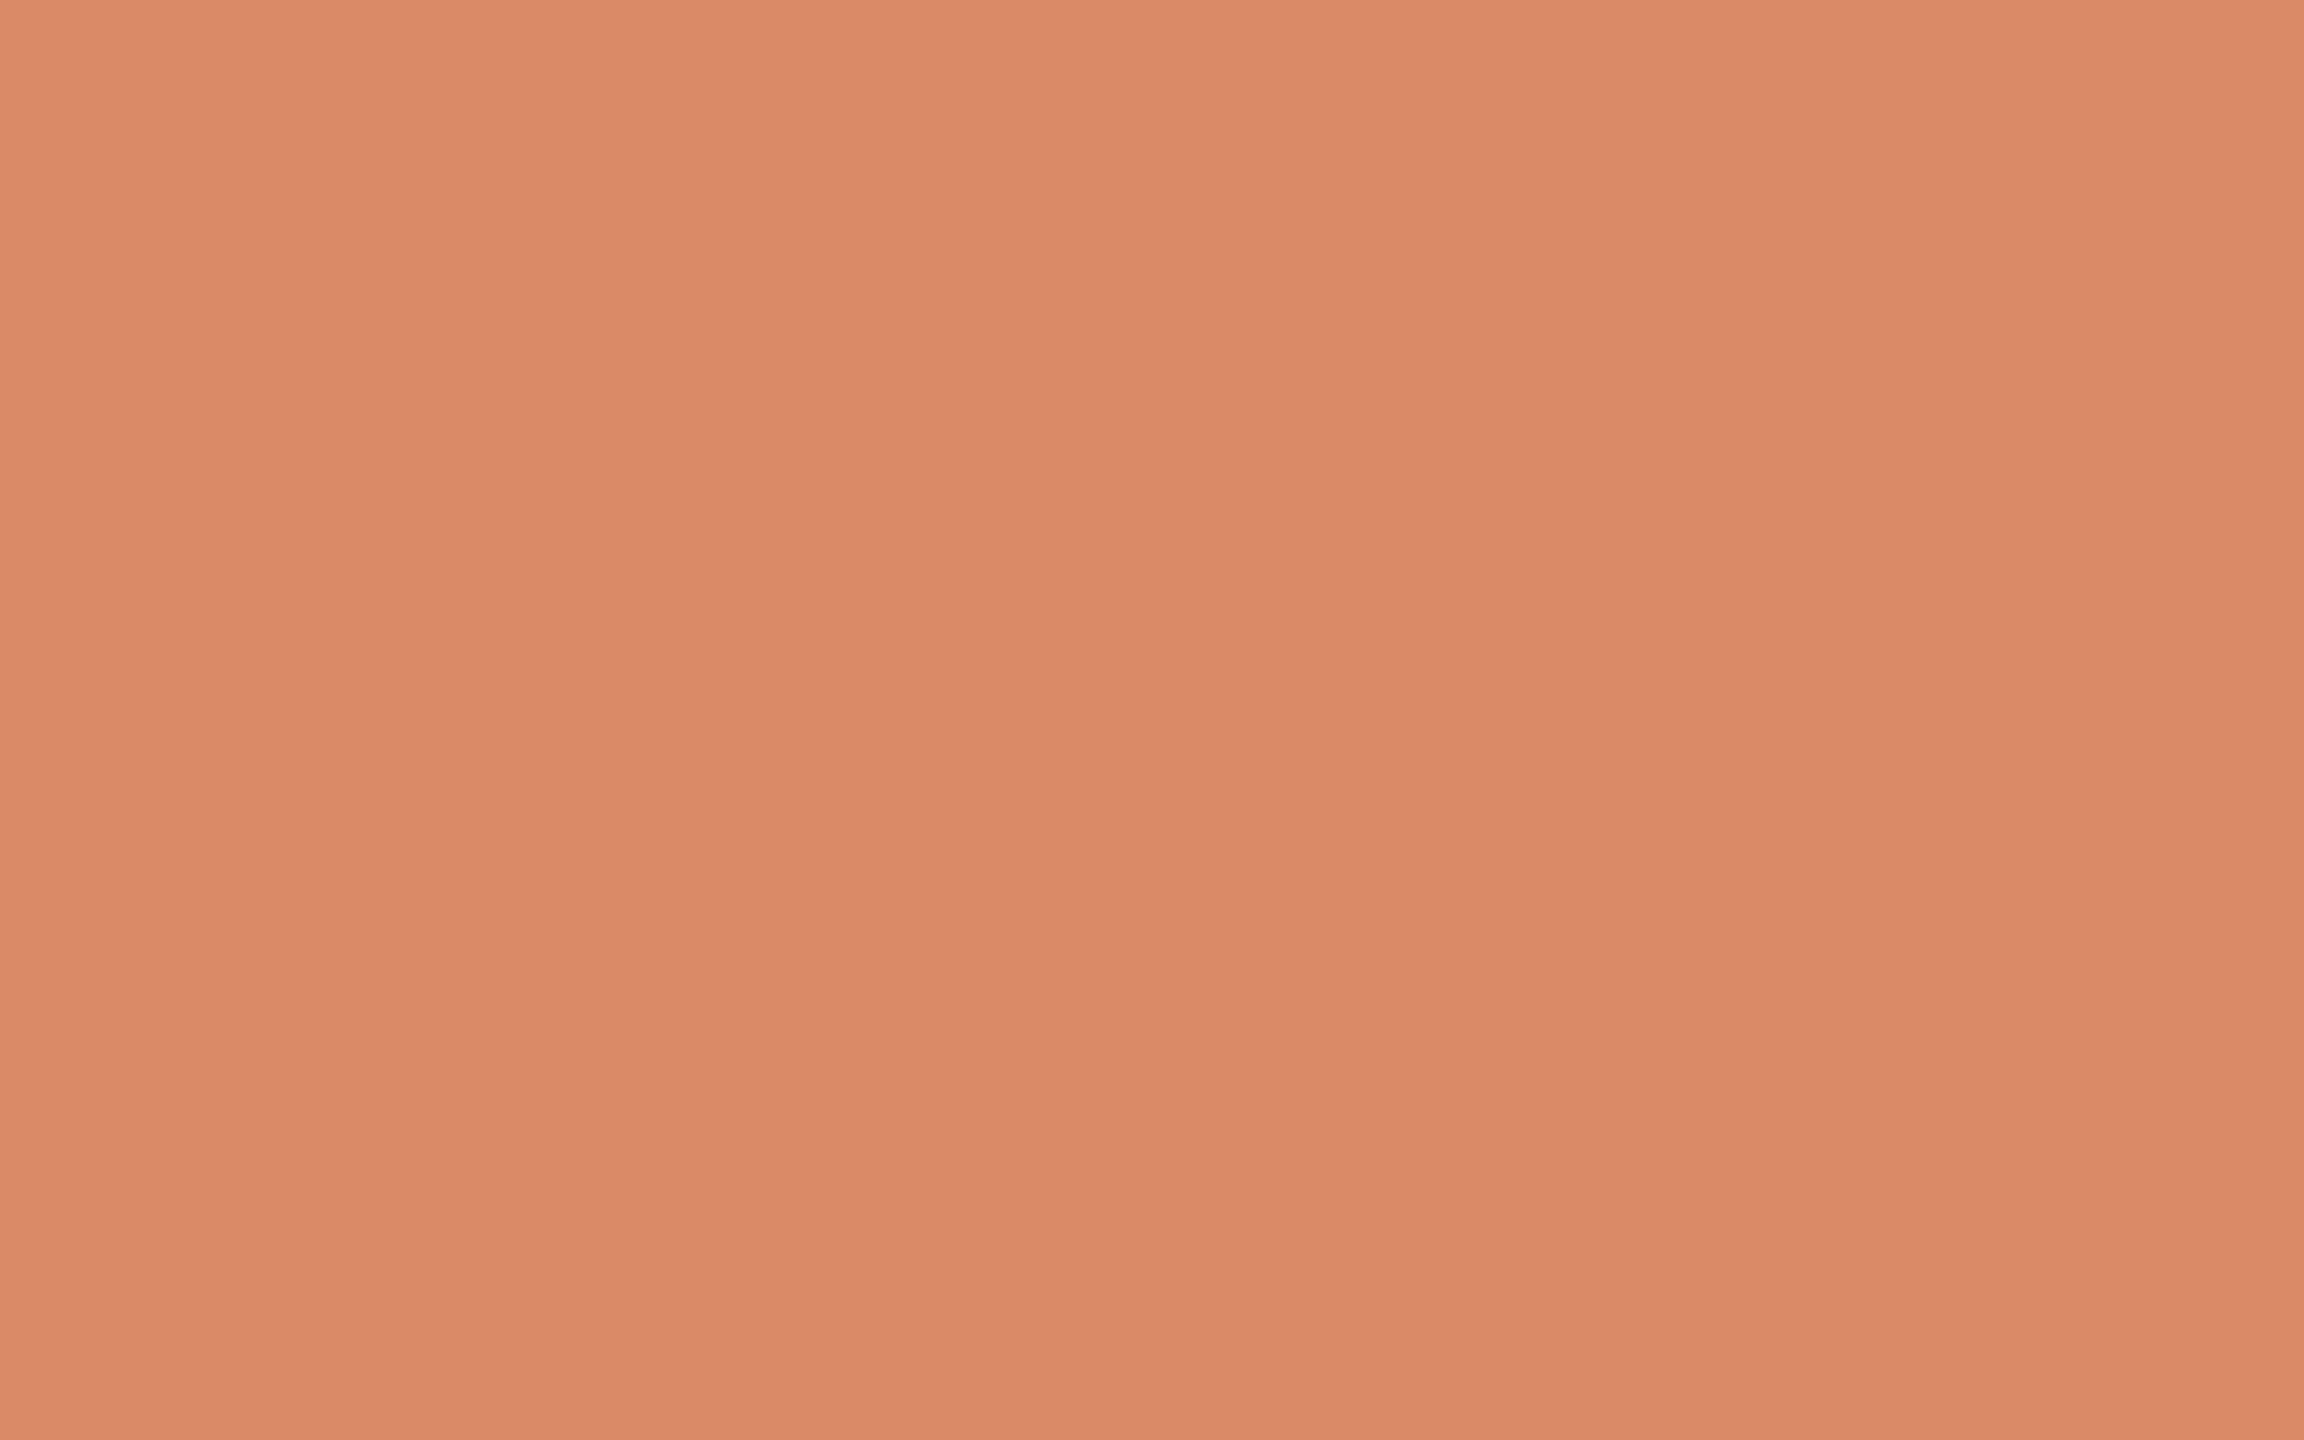 2304x1440 Copper Crayola Solid Color Background